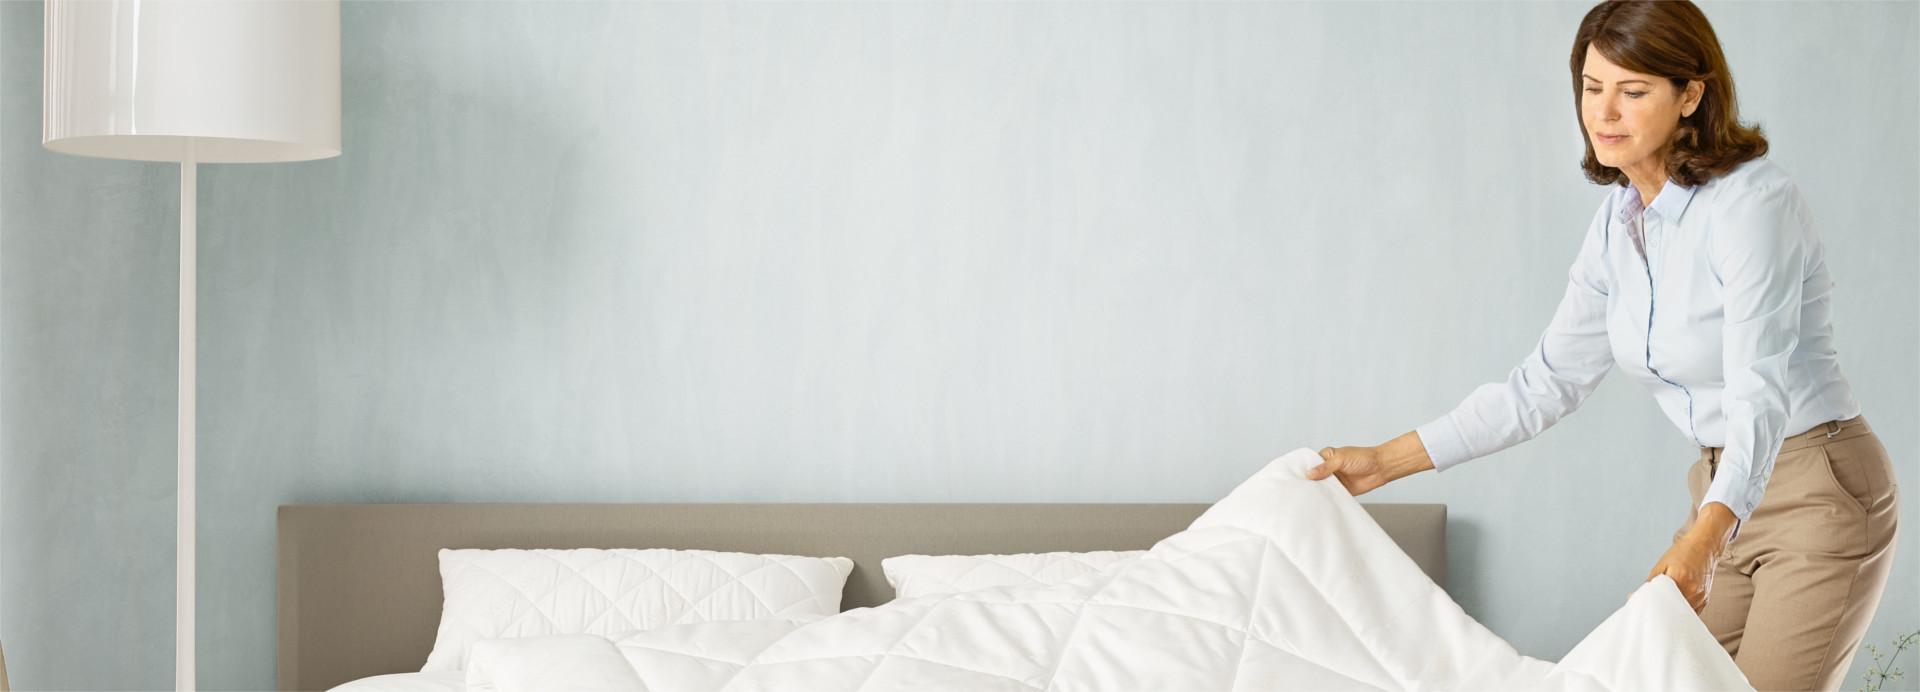 hygiene and sleeping comfort - Basi A Doghe Wenatex